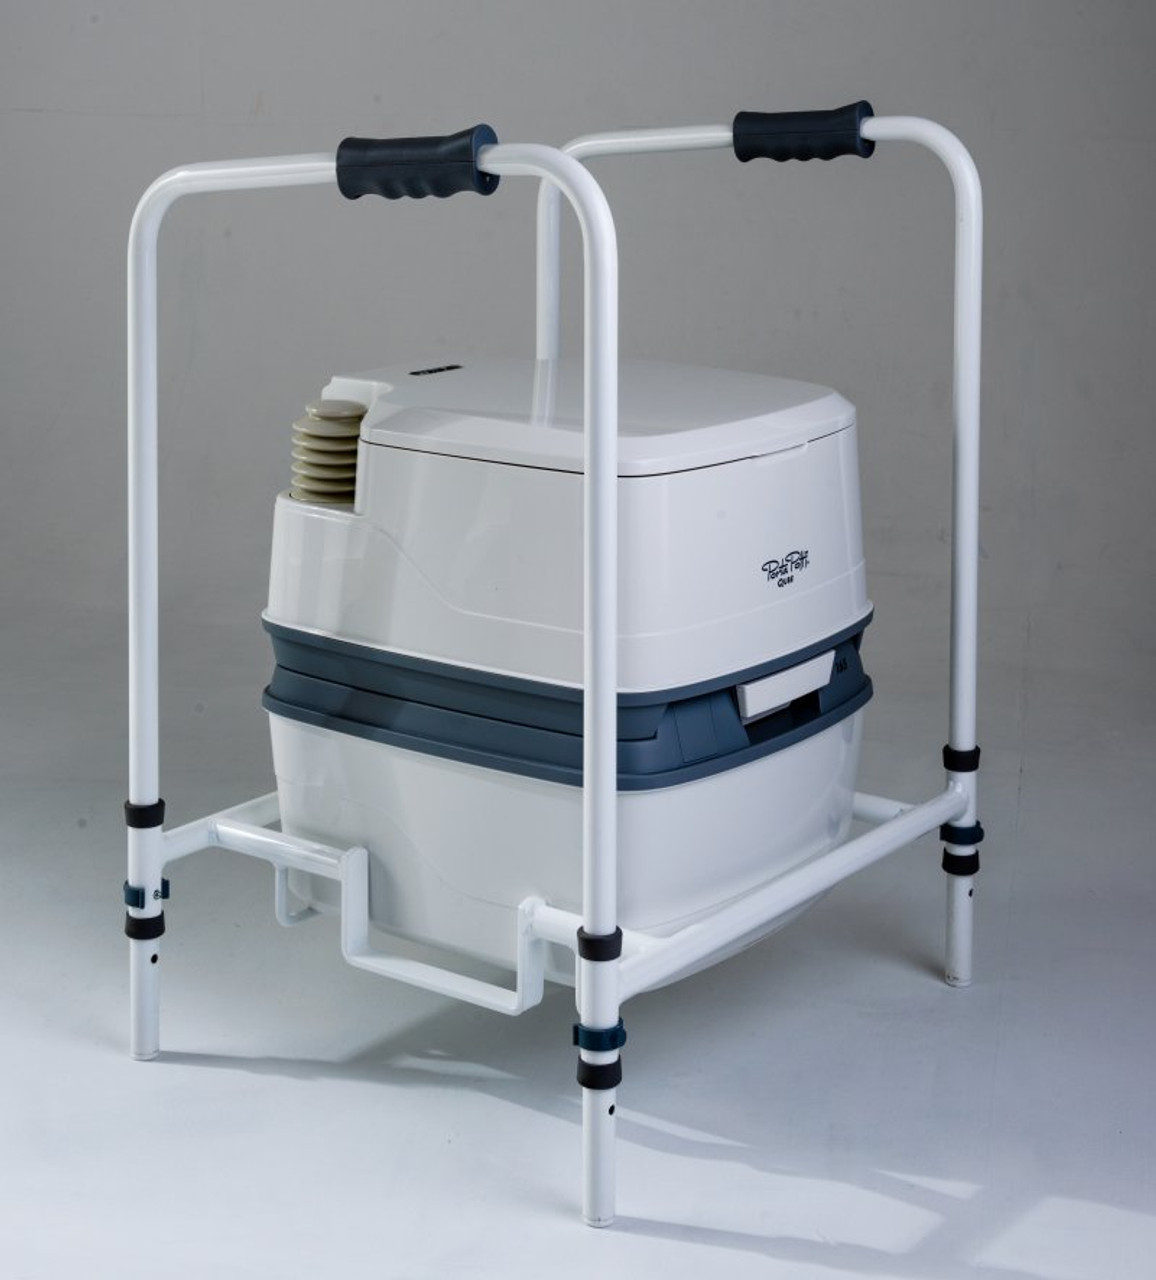 Thetford Dignified Toilet Porta Potti Aid with Folding ...